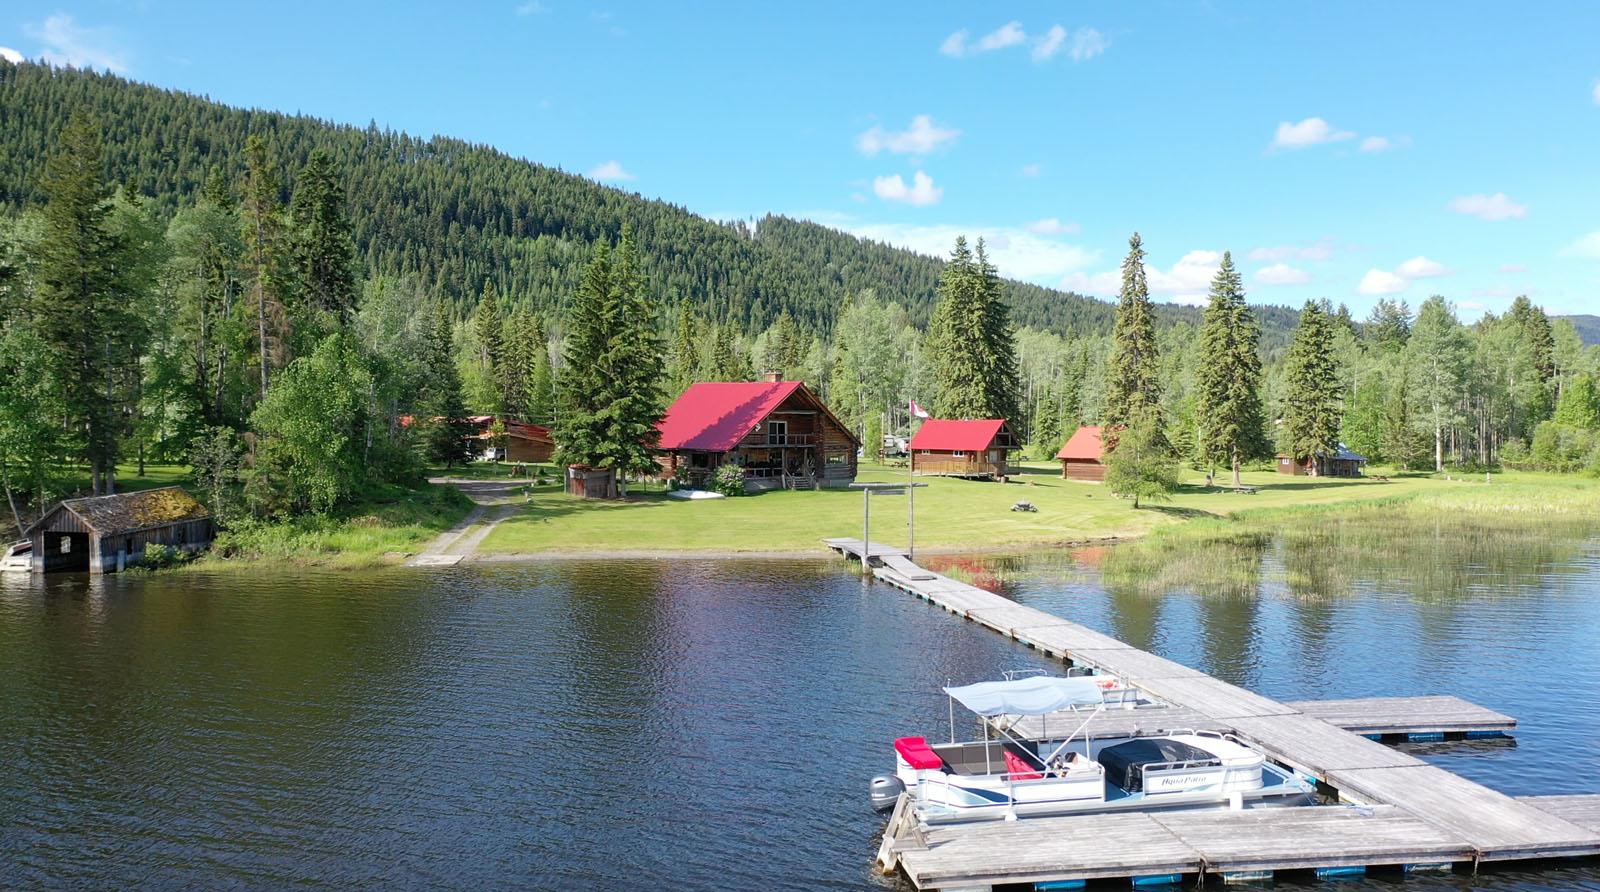 Canim lake resort 17